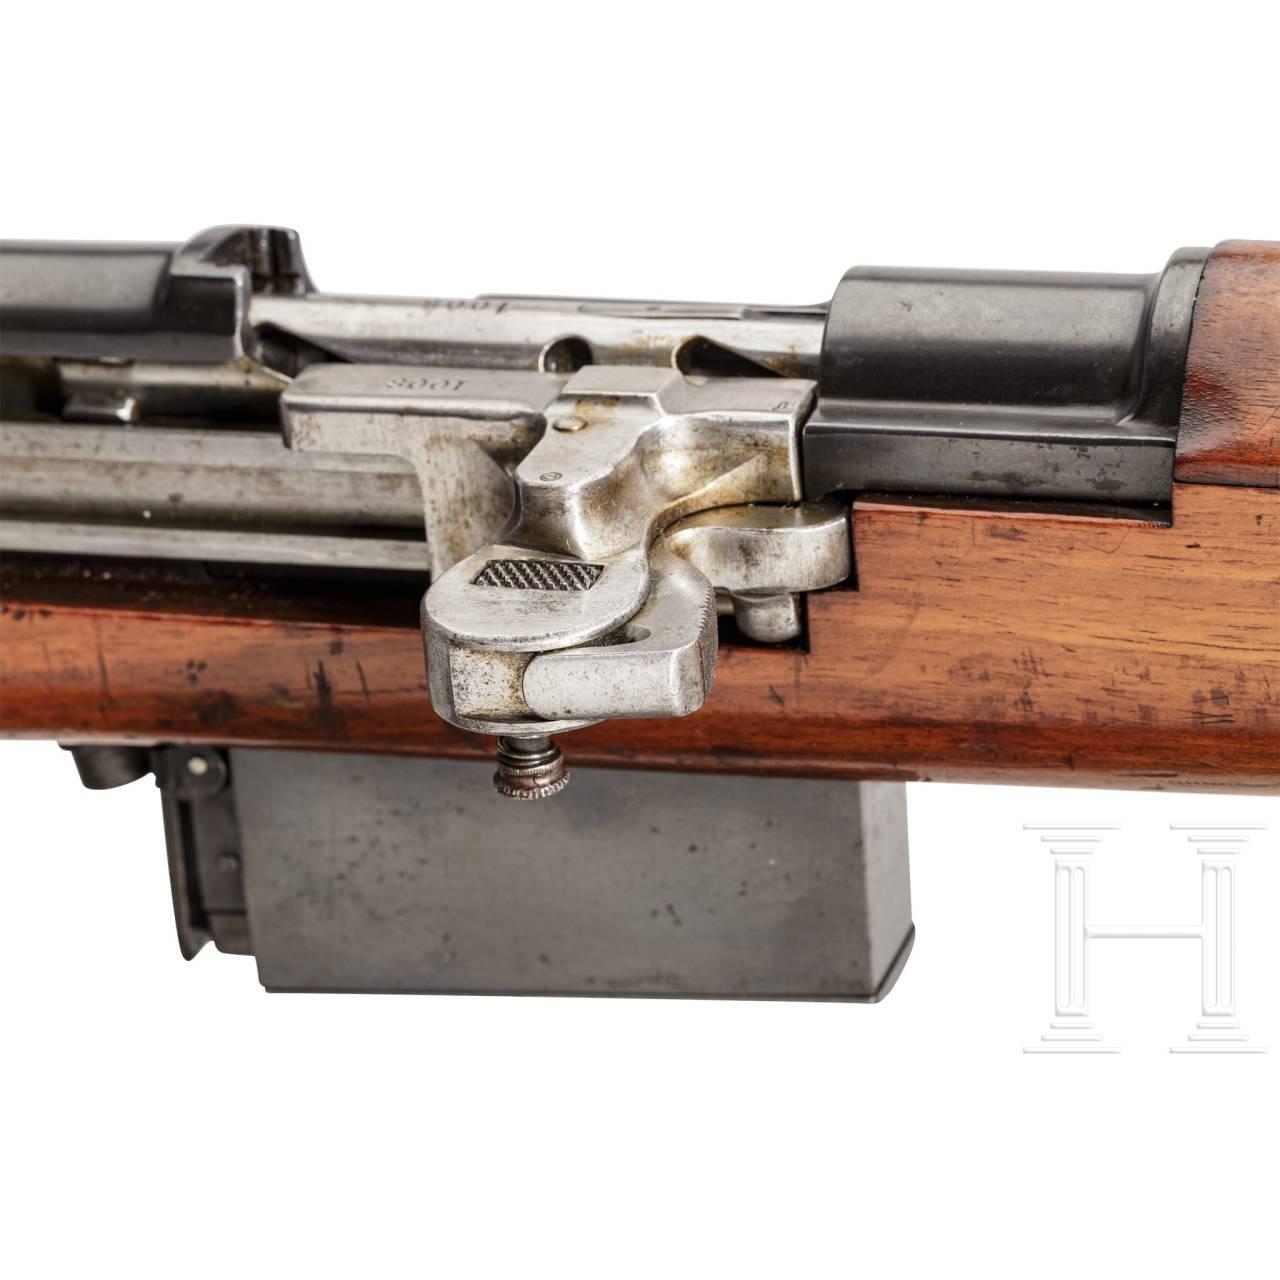 An Aviator's Self-Loading Carbine 15 (Mondragon)